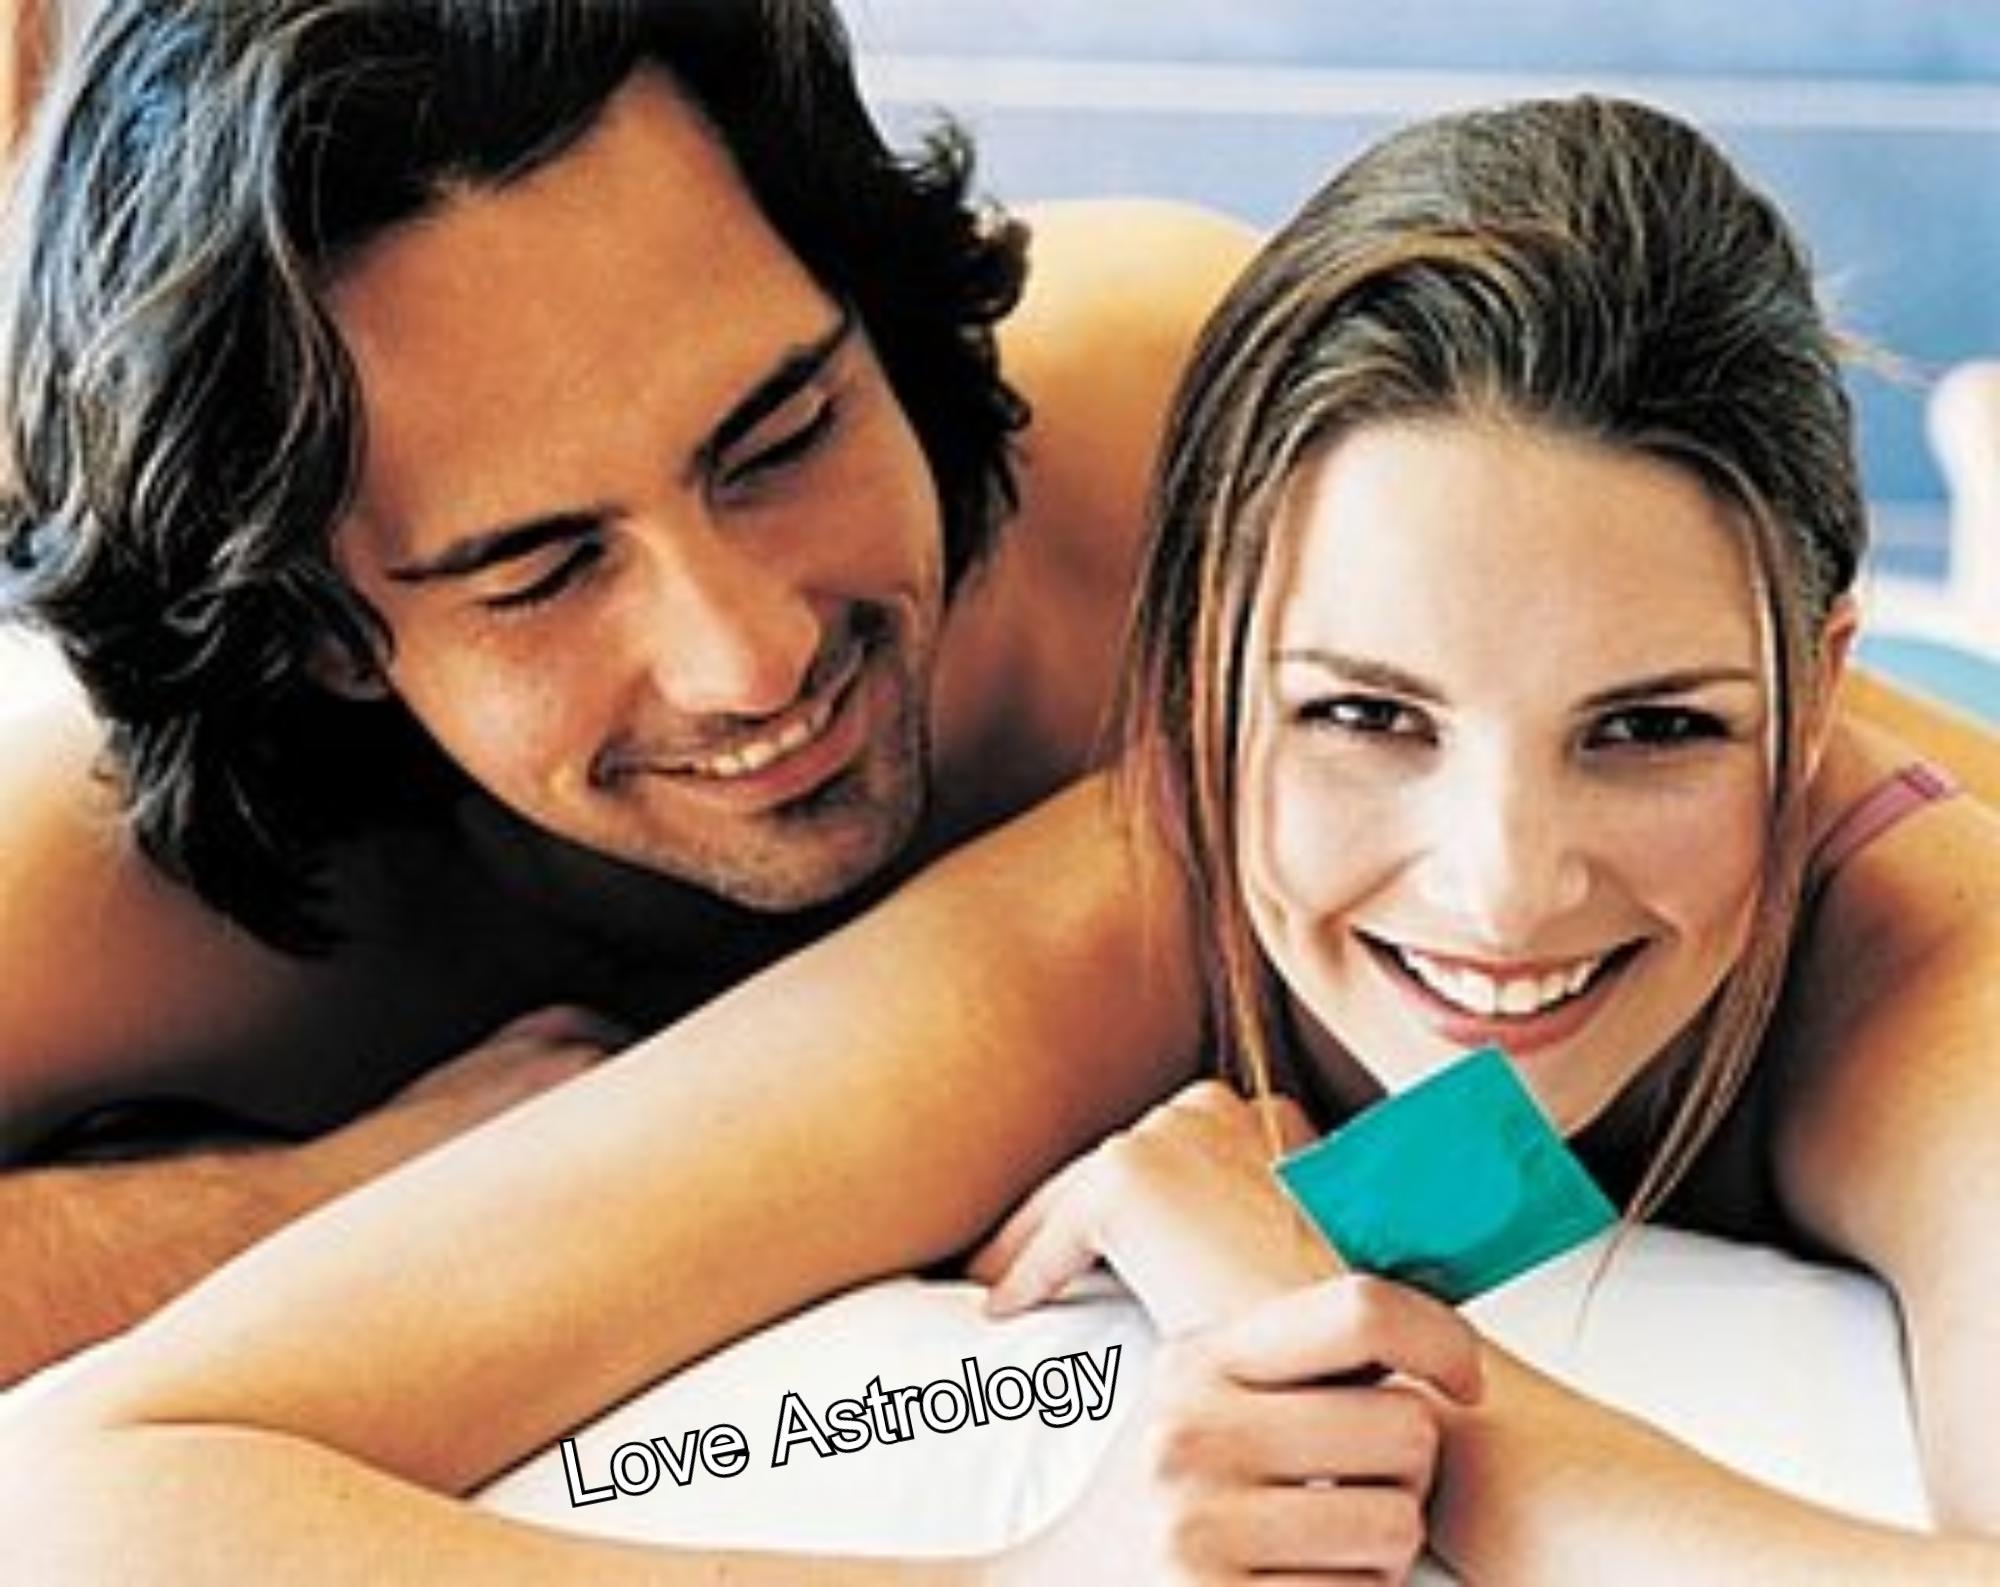 Презервативы женские онлайн 17 фотография